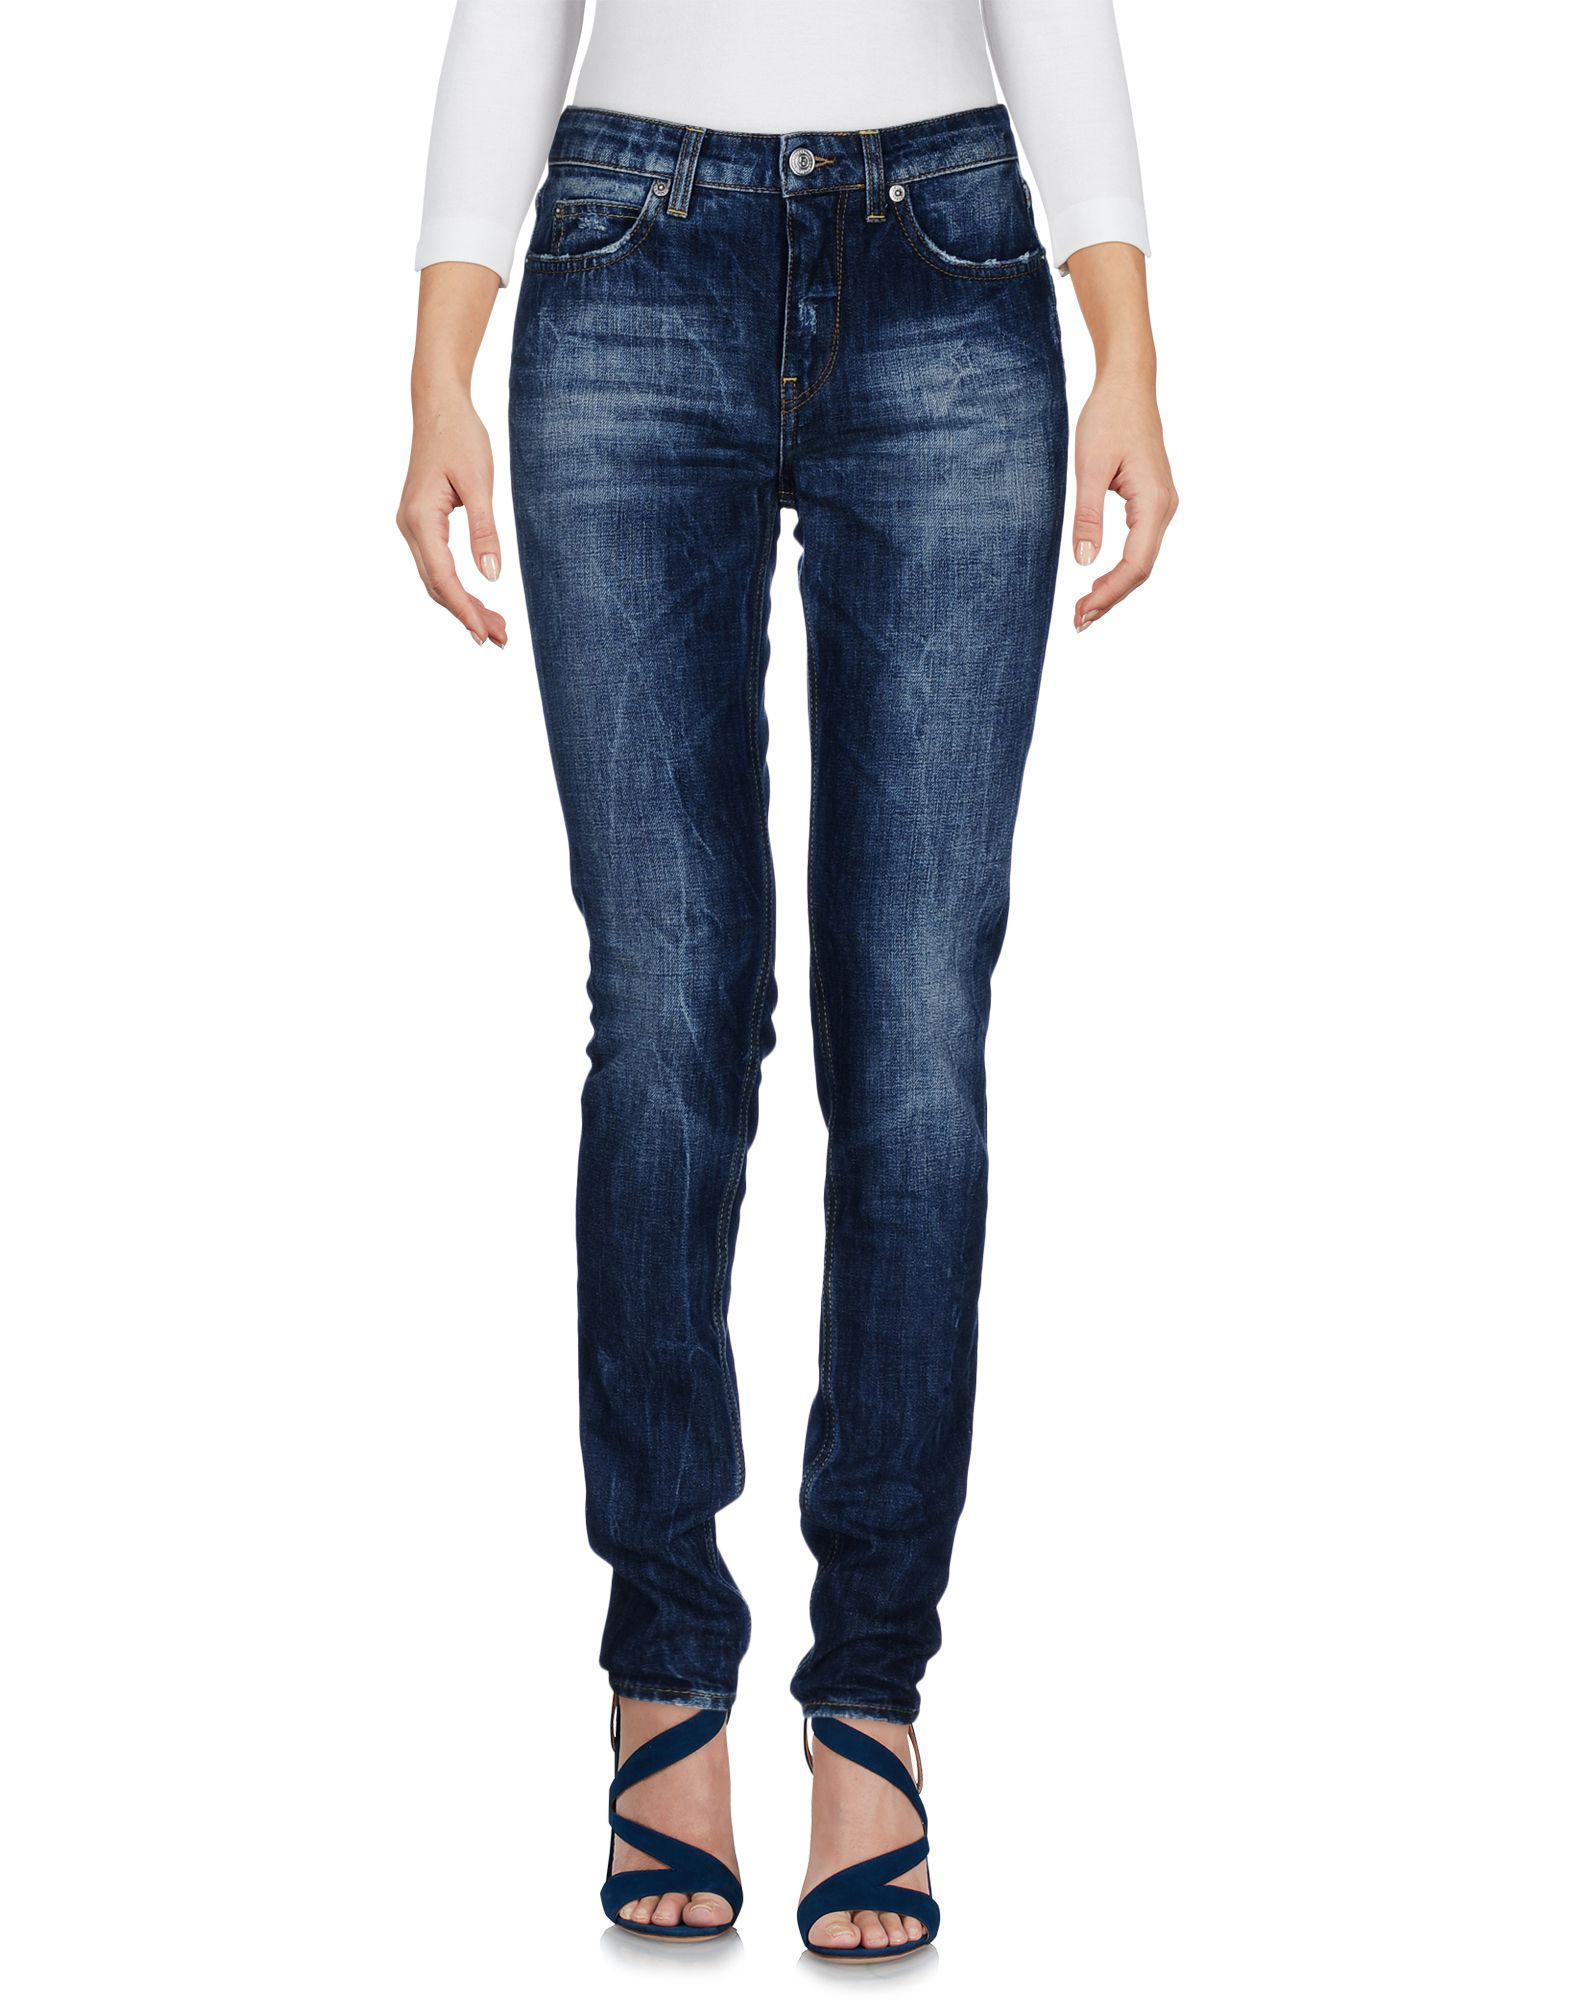 DENIM - Denim trousers Department 5 0egX2